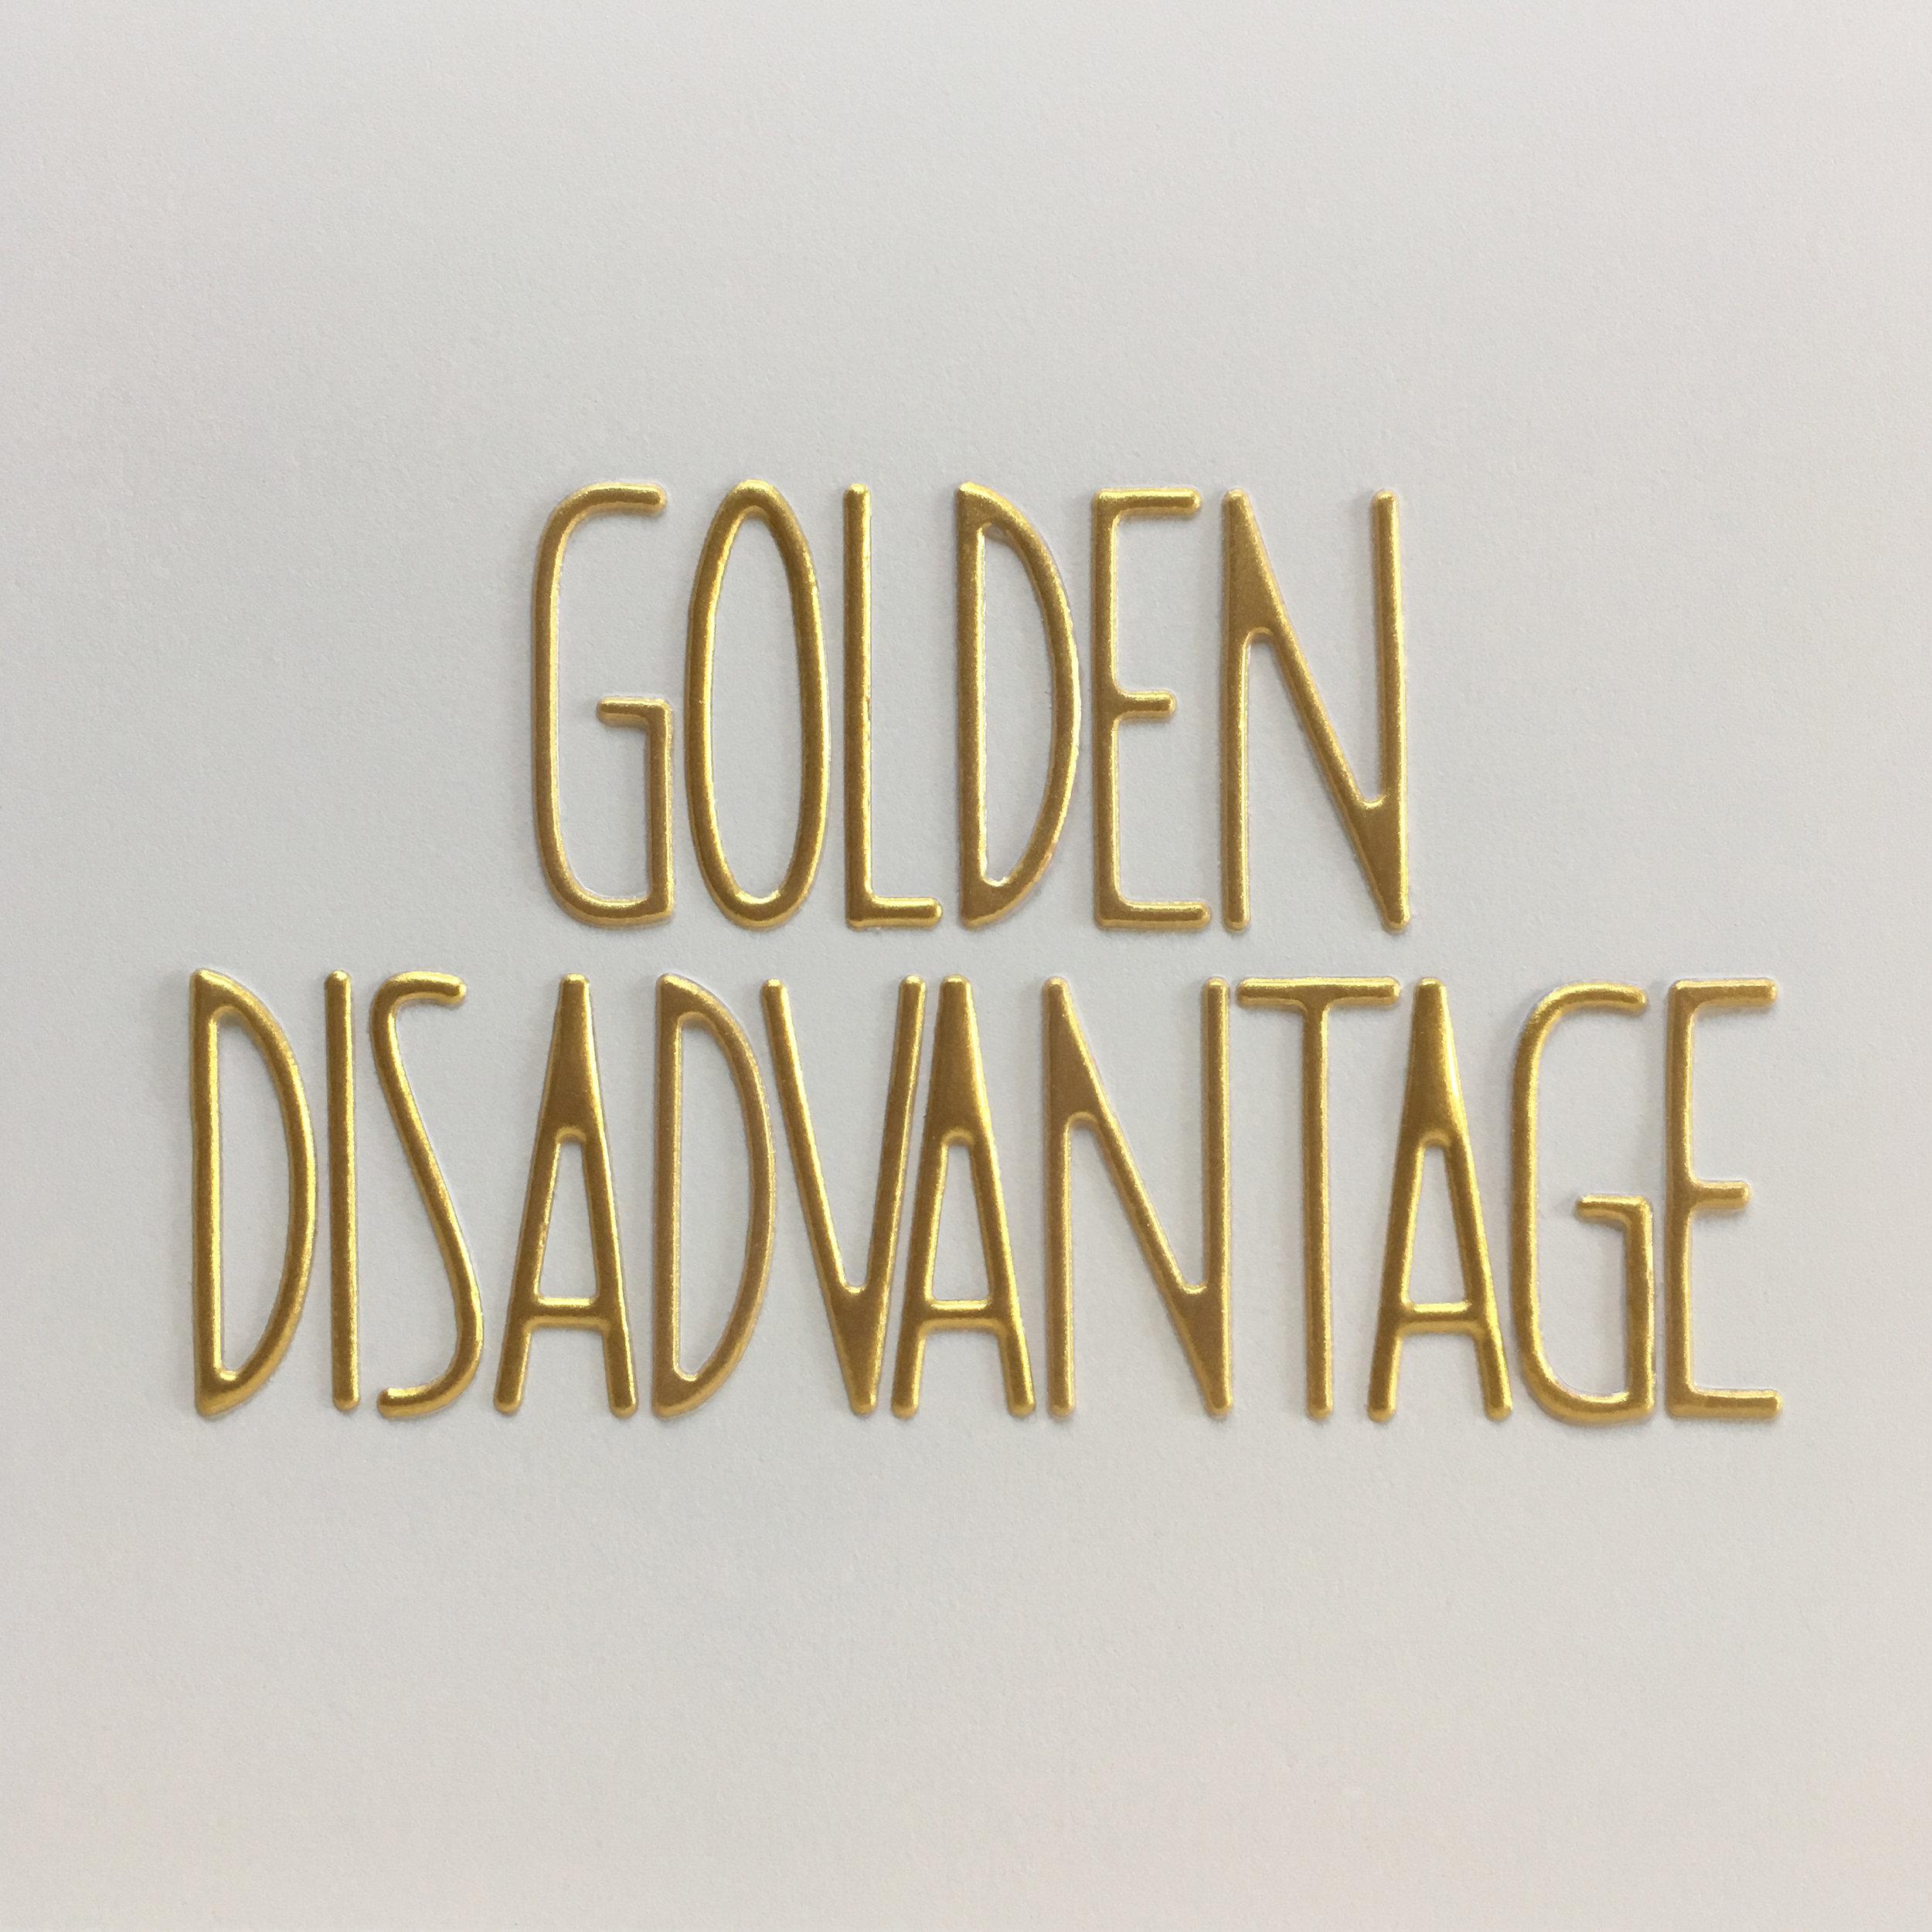 golden disadvantage.jpg